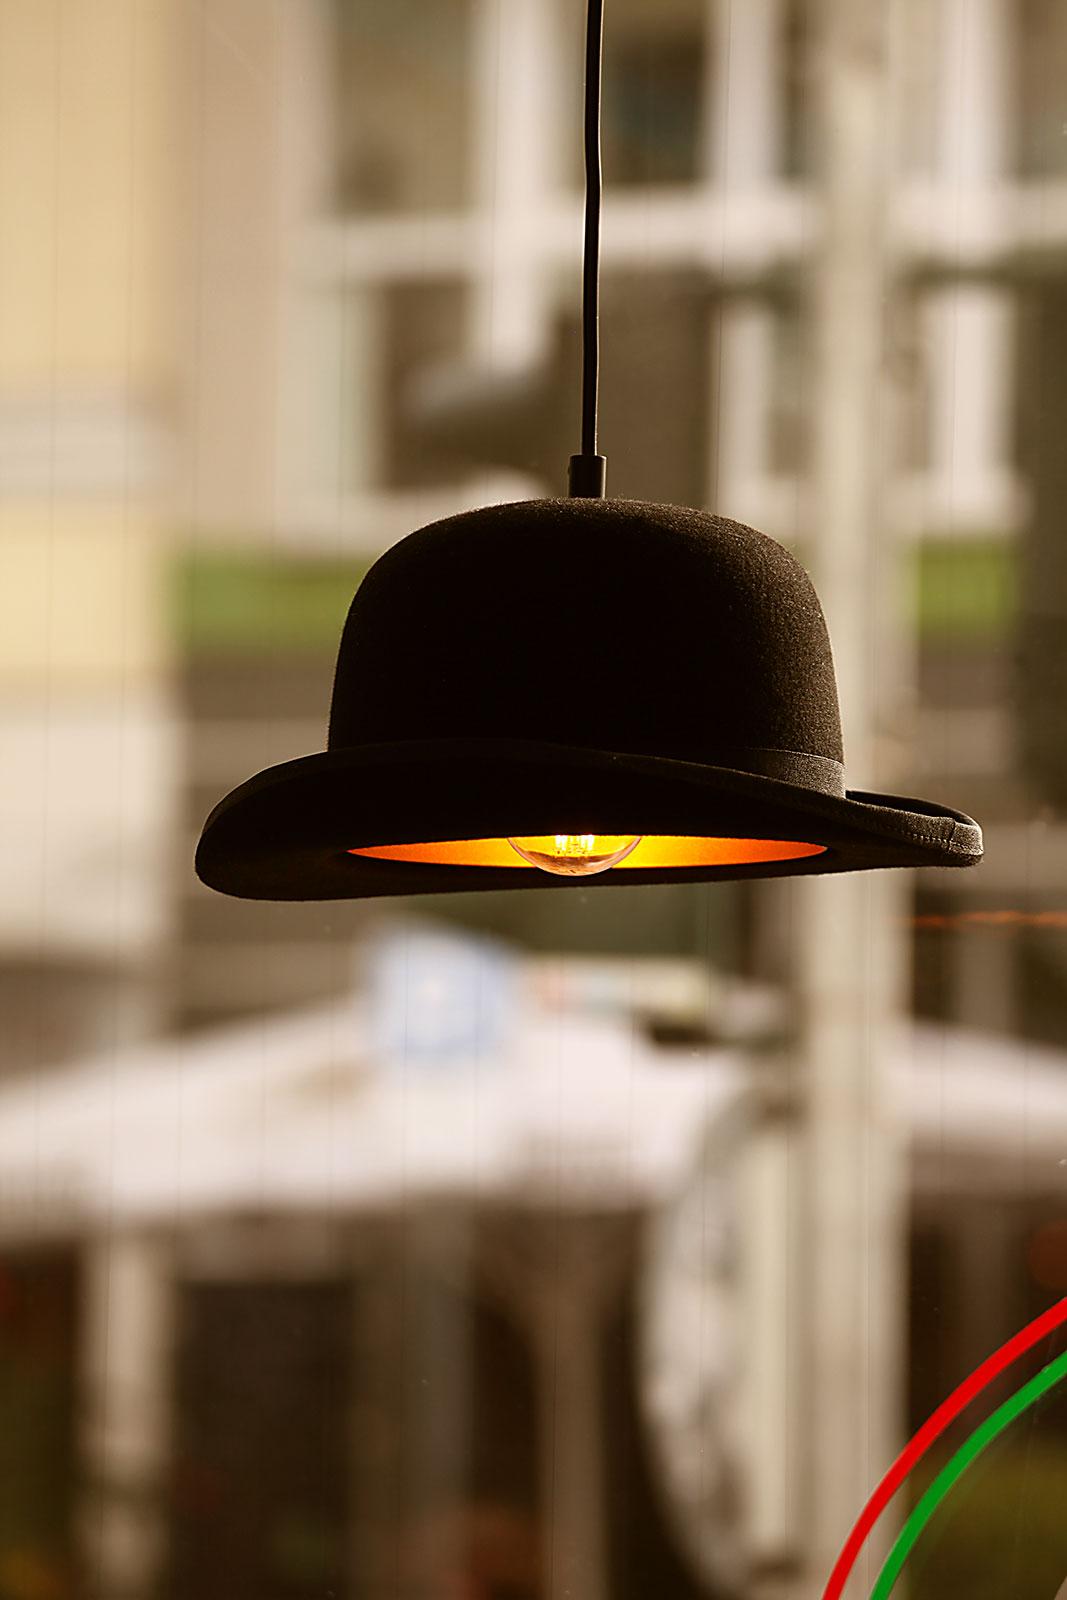 pizzeria dick doof l originale seit 1972 in frankfurt am main bornheim und sachsenhausen. Black Bedroom Furniture Sets. Home Design Ideas